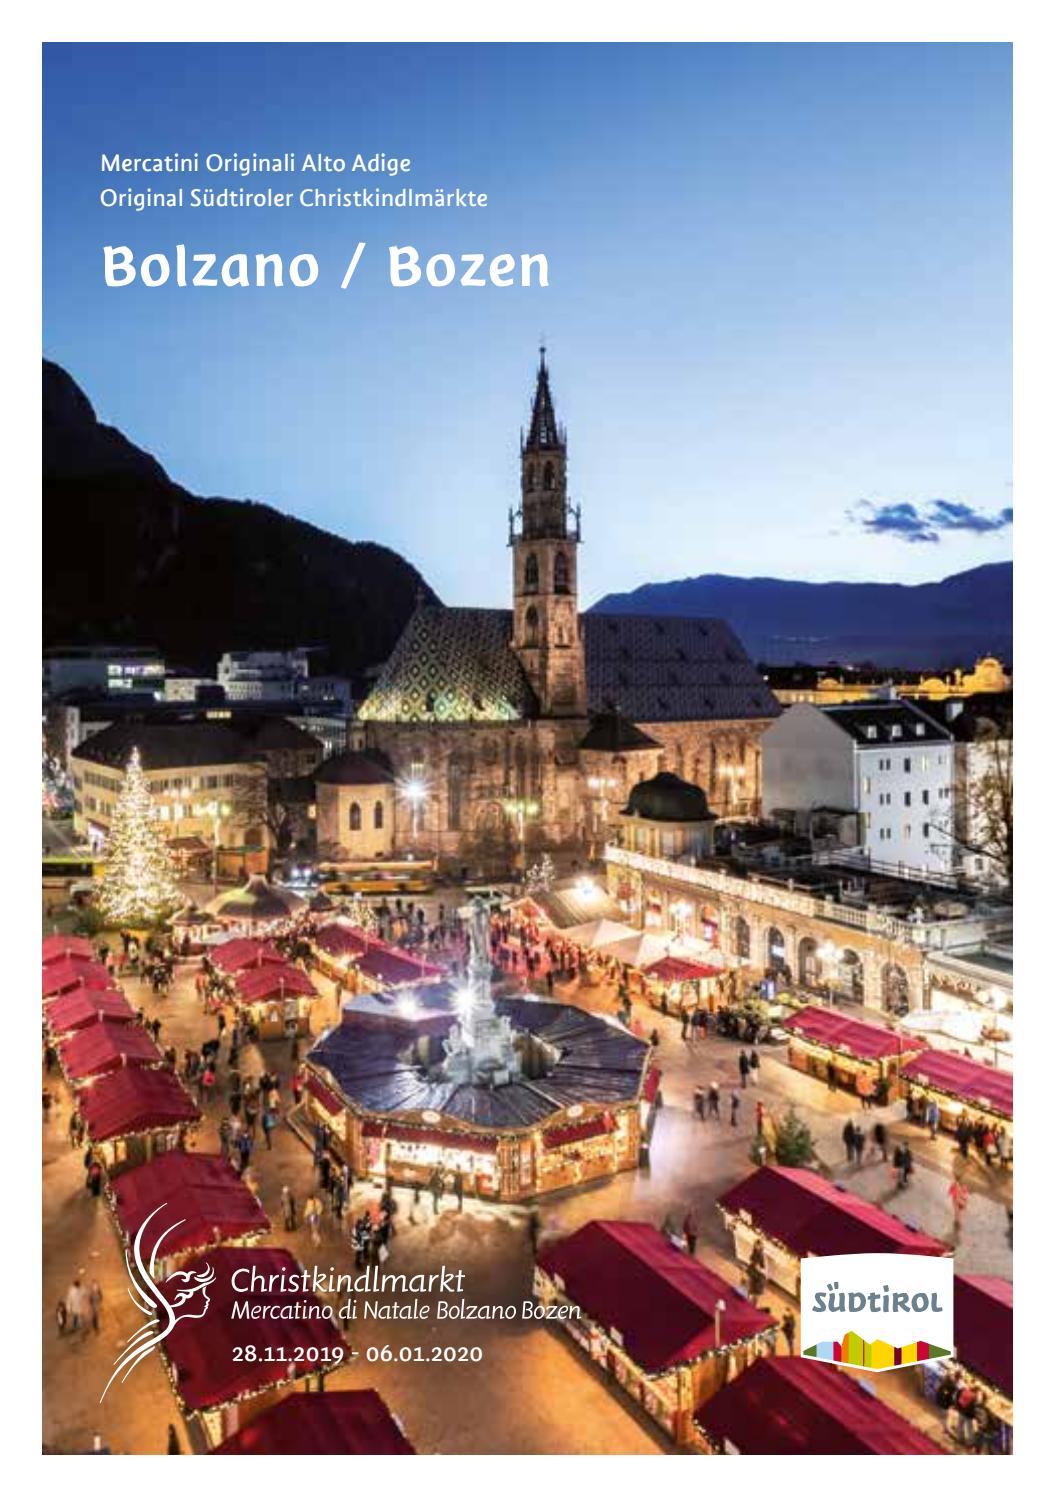 Bolzano Mercatini Di Natale.Mercatino Di Natale Bolzano Bozner Christkindlmarkt 2019 2020 By Bolzano Bozen Issuu